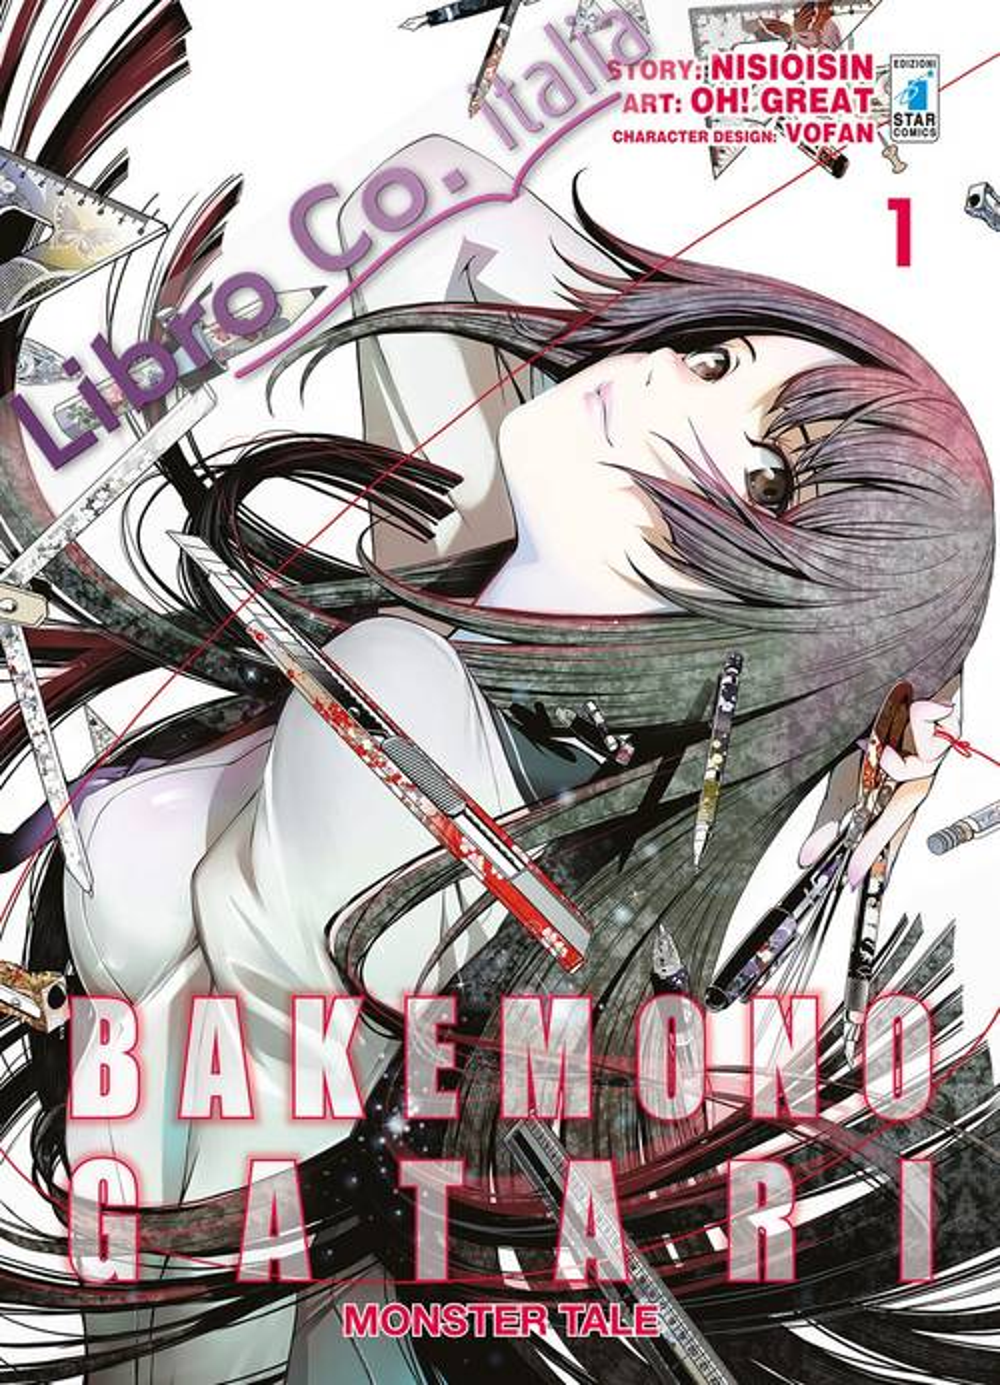 Bakemonogatari. Monster tale. Vol. 1